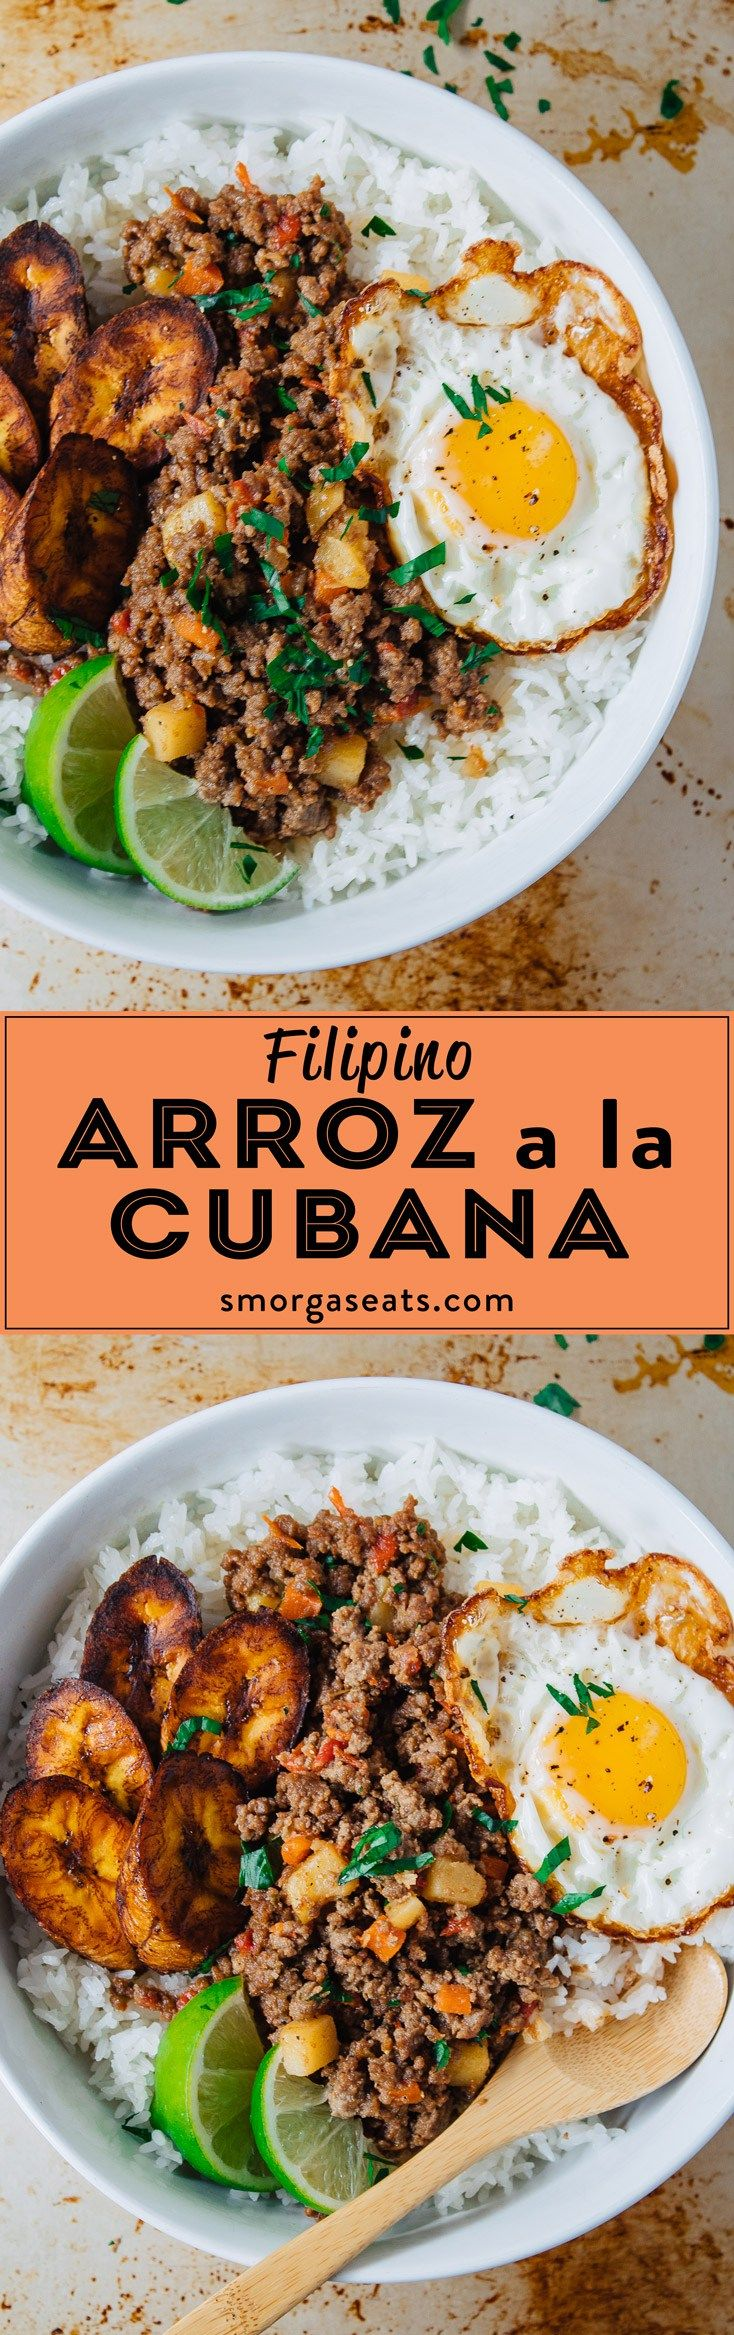 Photo of Filipino Arroz a la Cubana – Smorgaseats